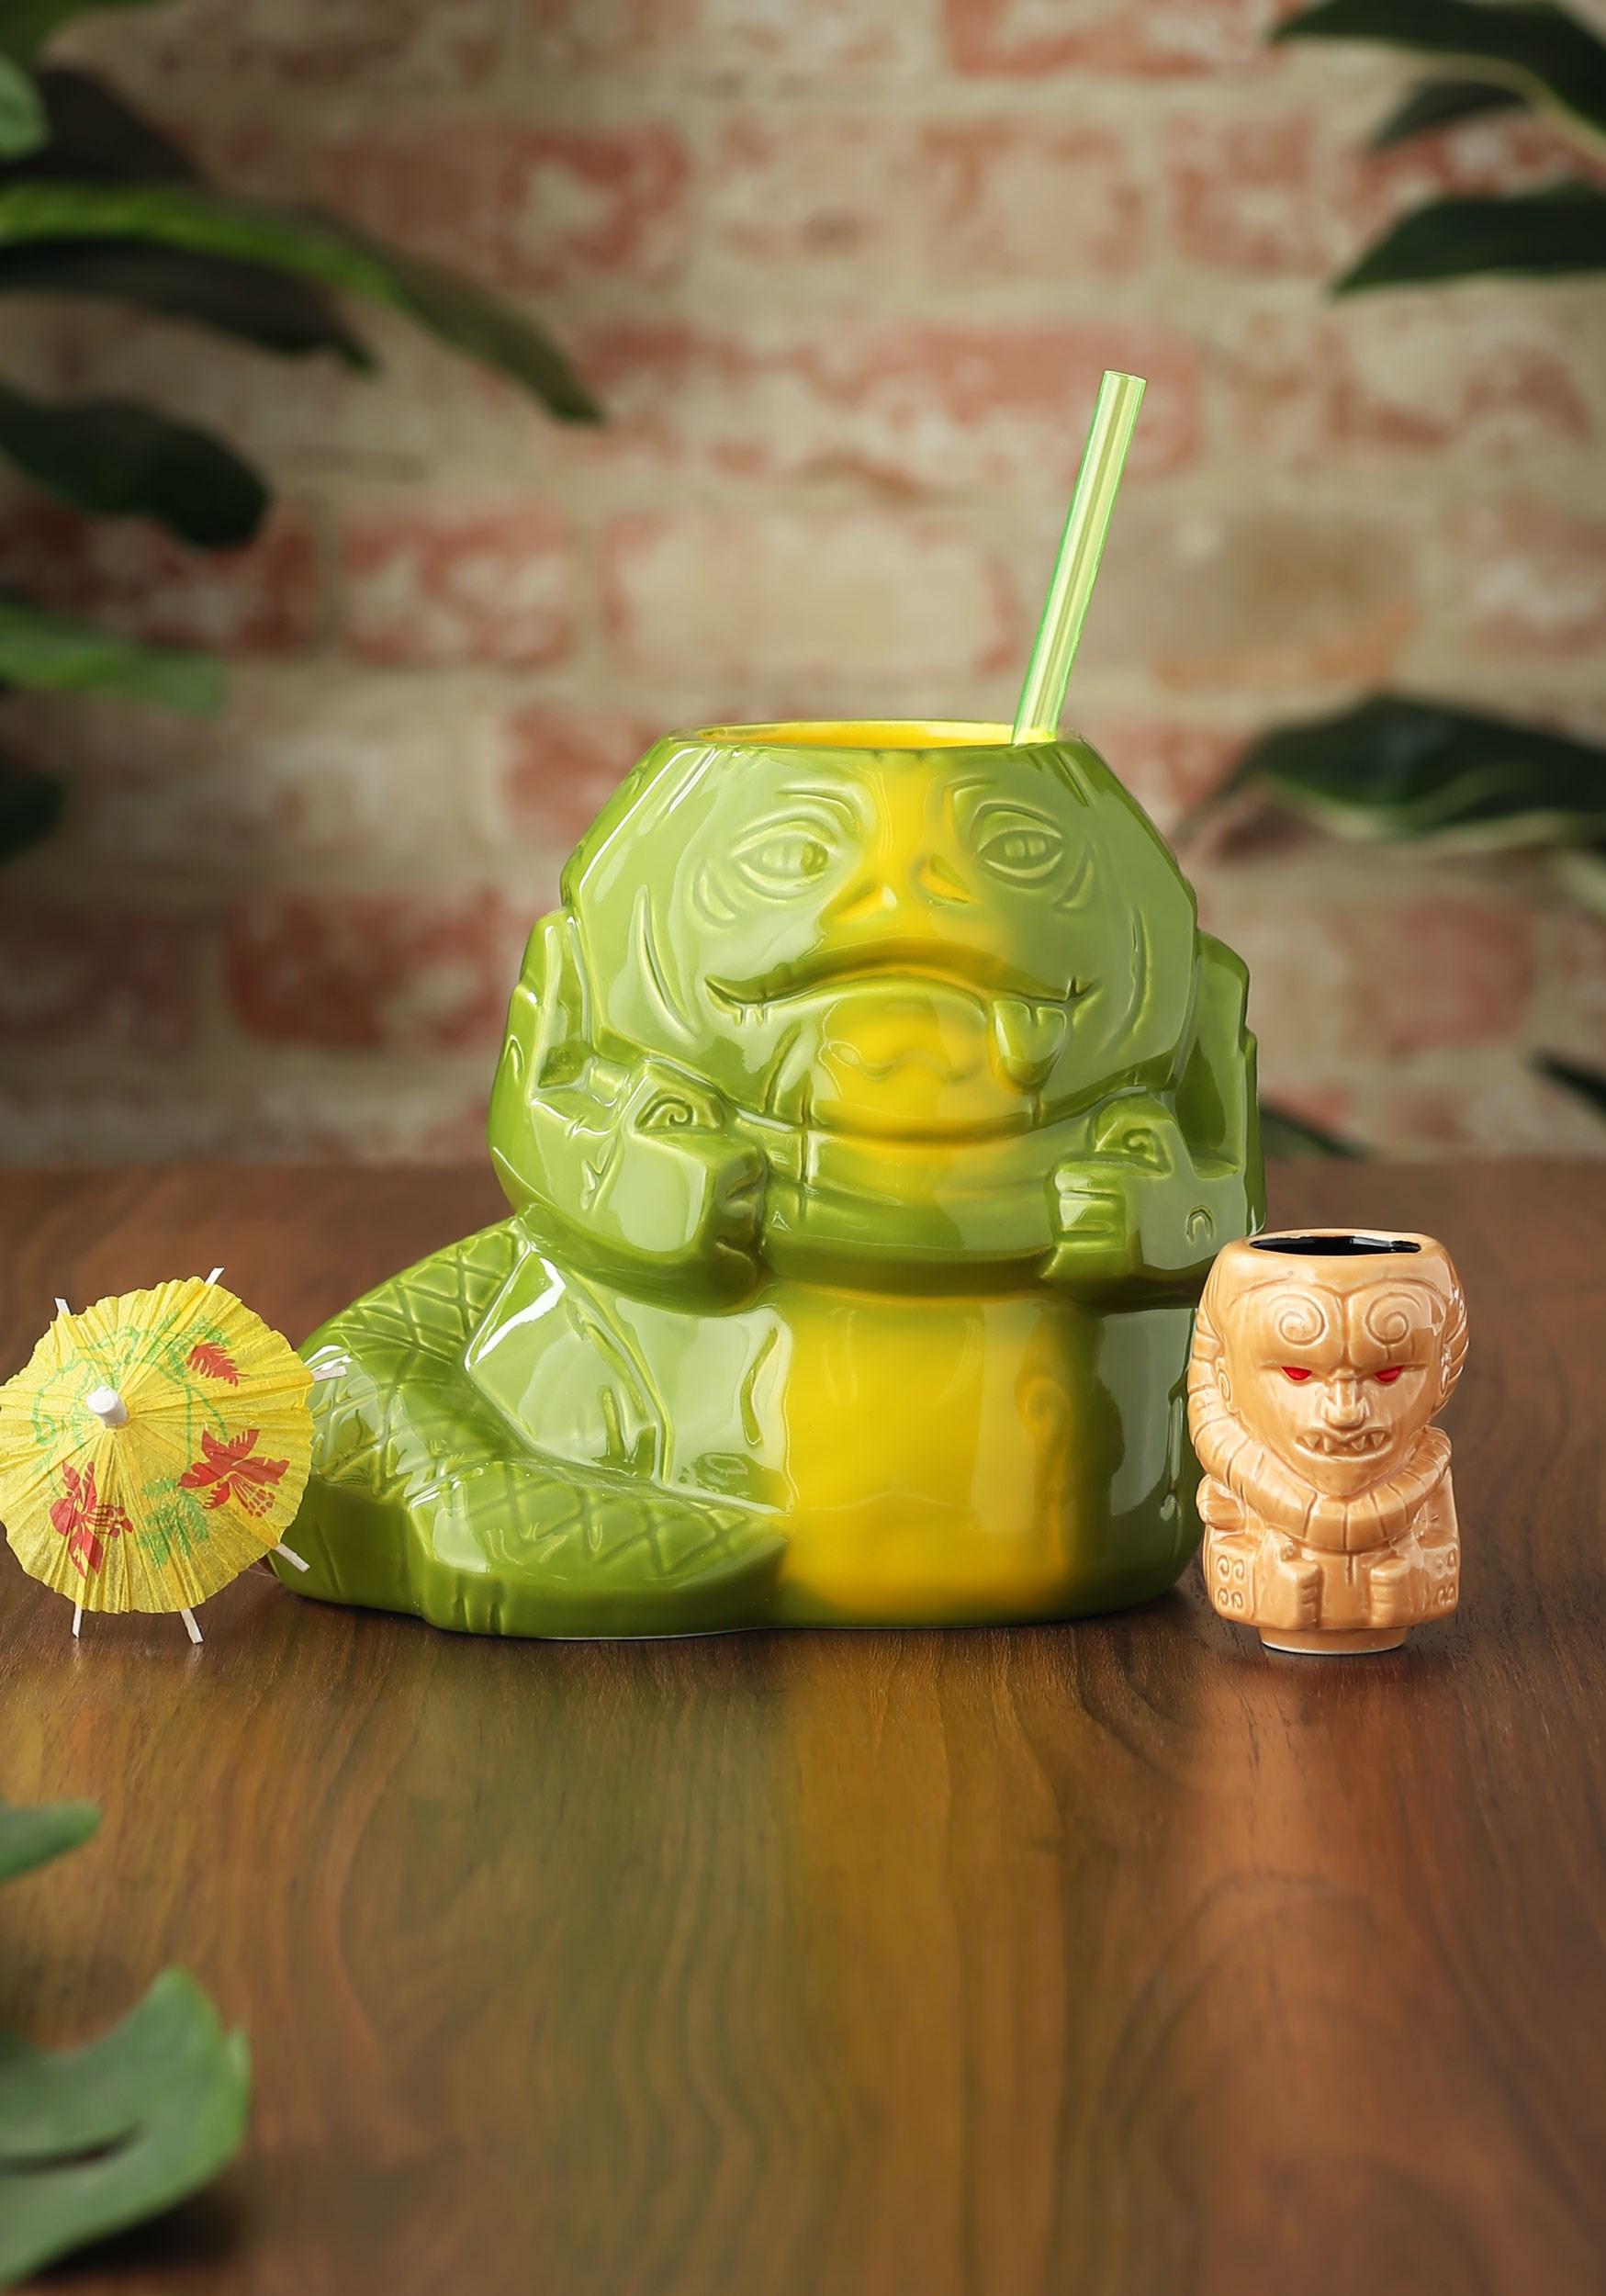 Geeki Tiki Jabba the Hutt 40oz Tiki Mug and Bib Fortuna Mini Tiki Mug